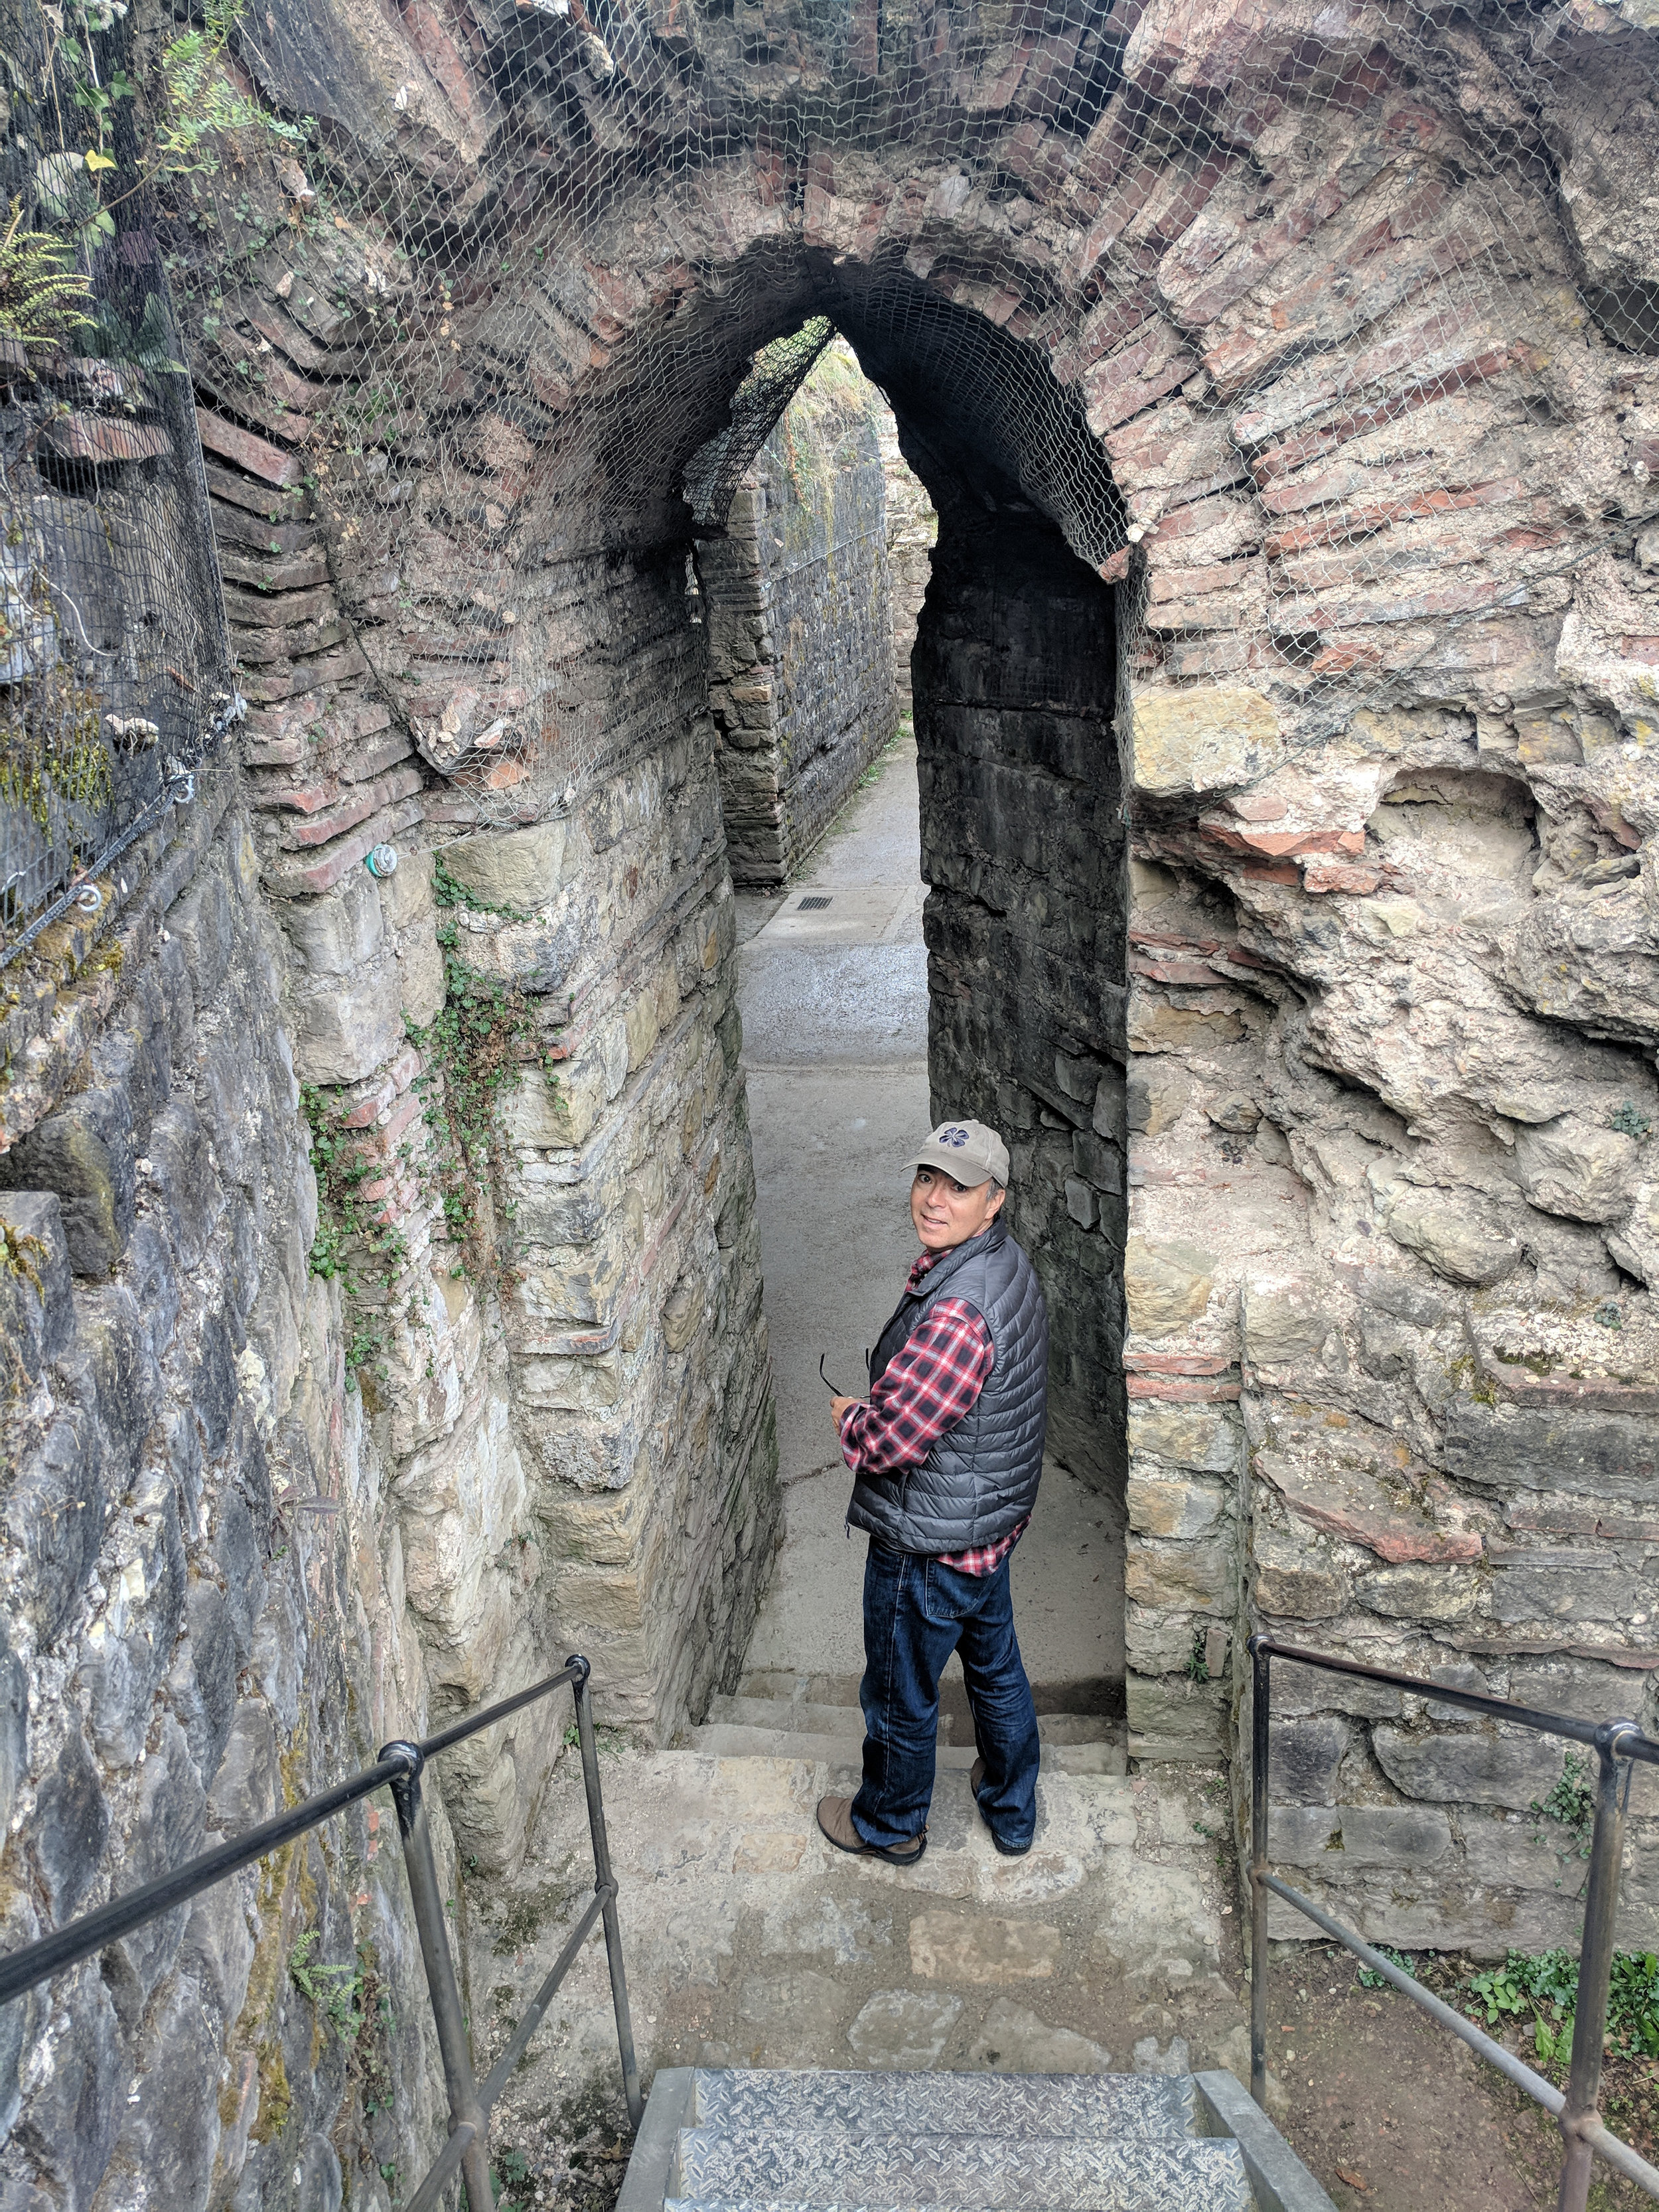 Iain explores the underground tunnels of the Roman baths